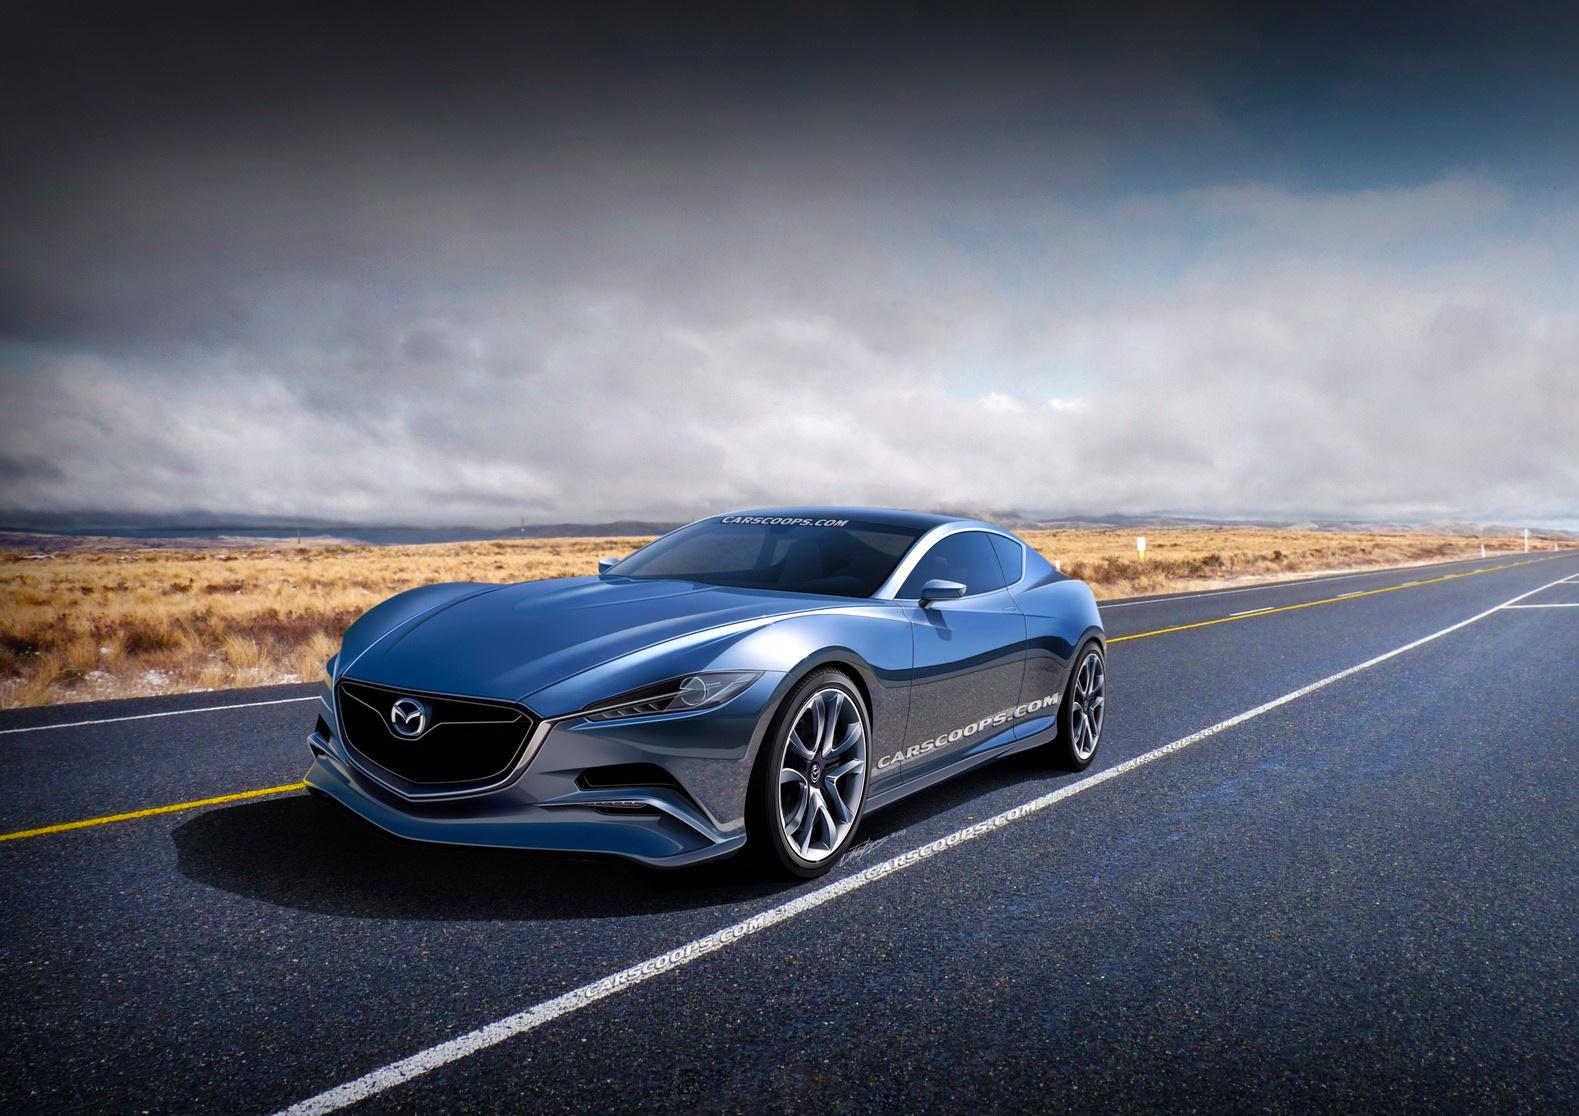 2017-Mazda-RX-7-Carscoops[4]